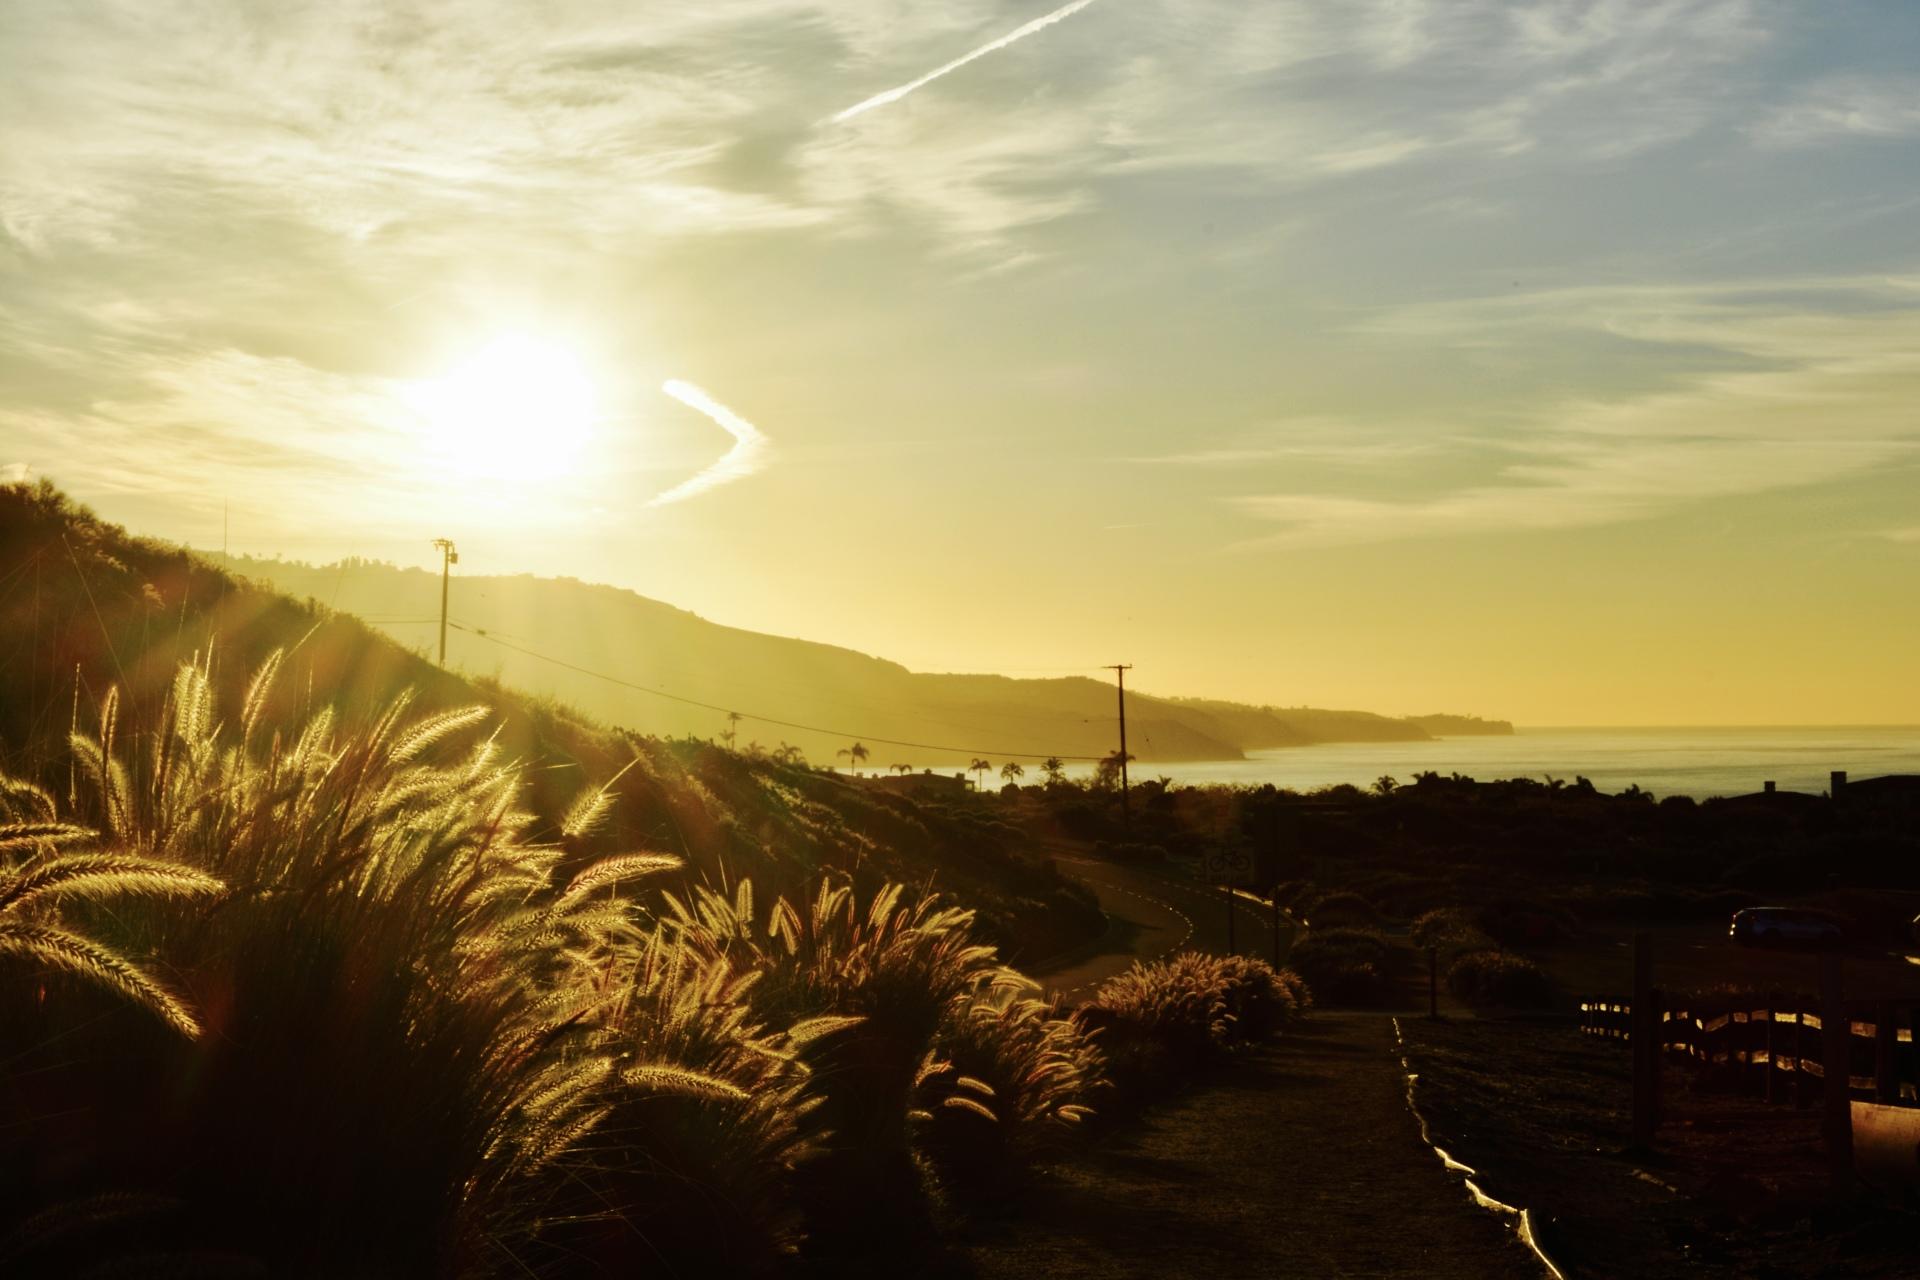 Sunrise in Rancho Palos Verdes, CA